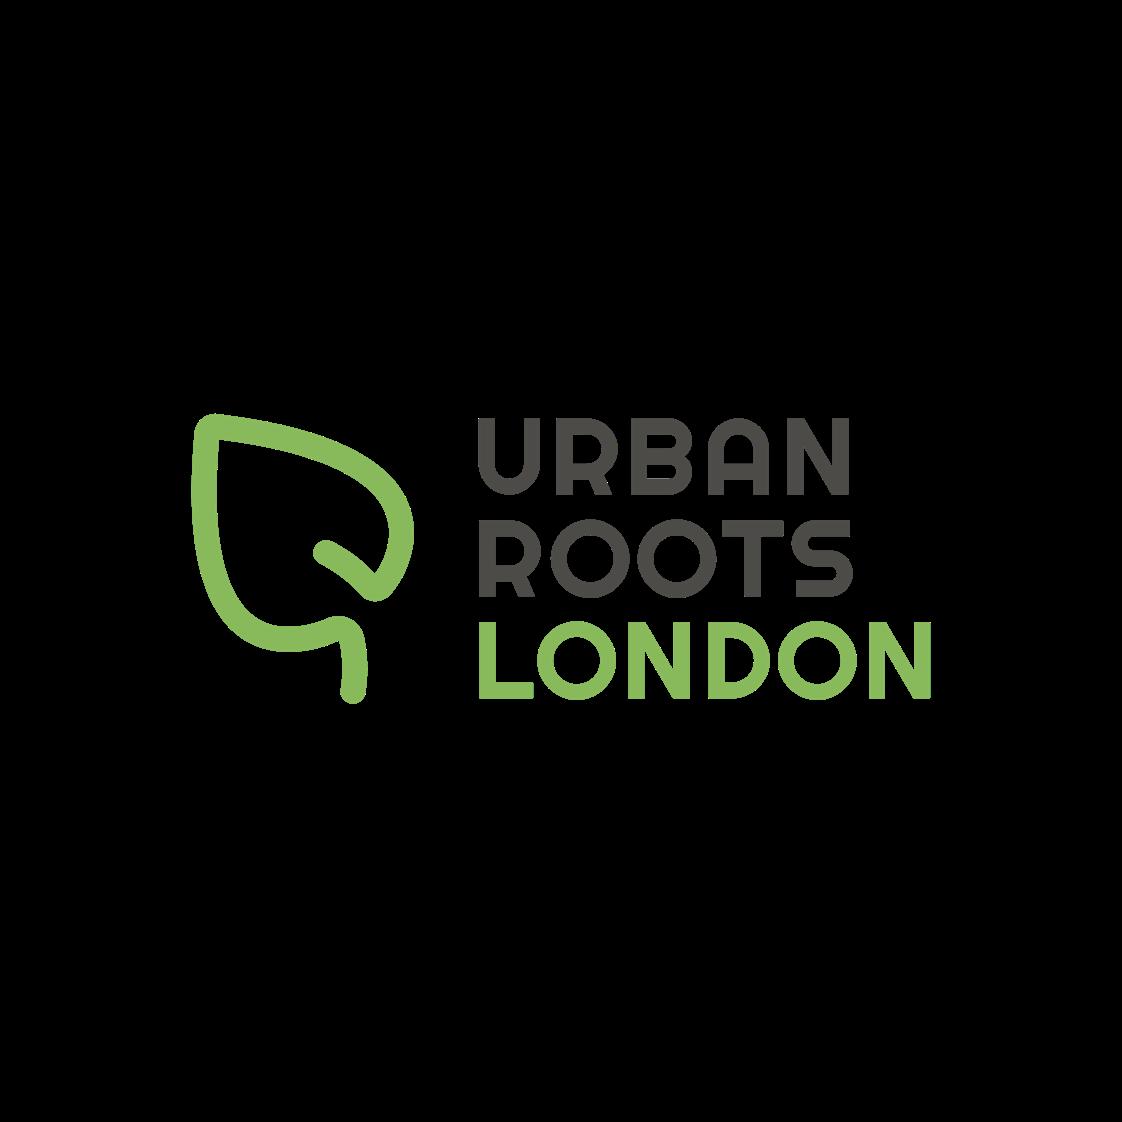 Urban Roots London